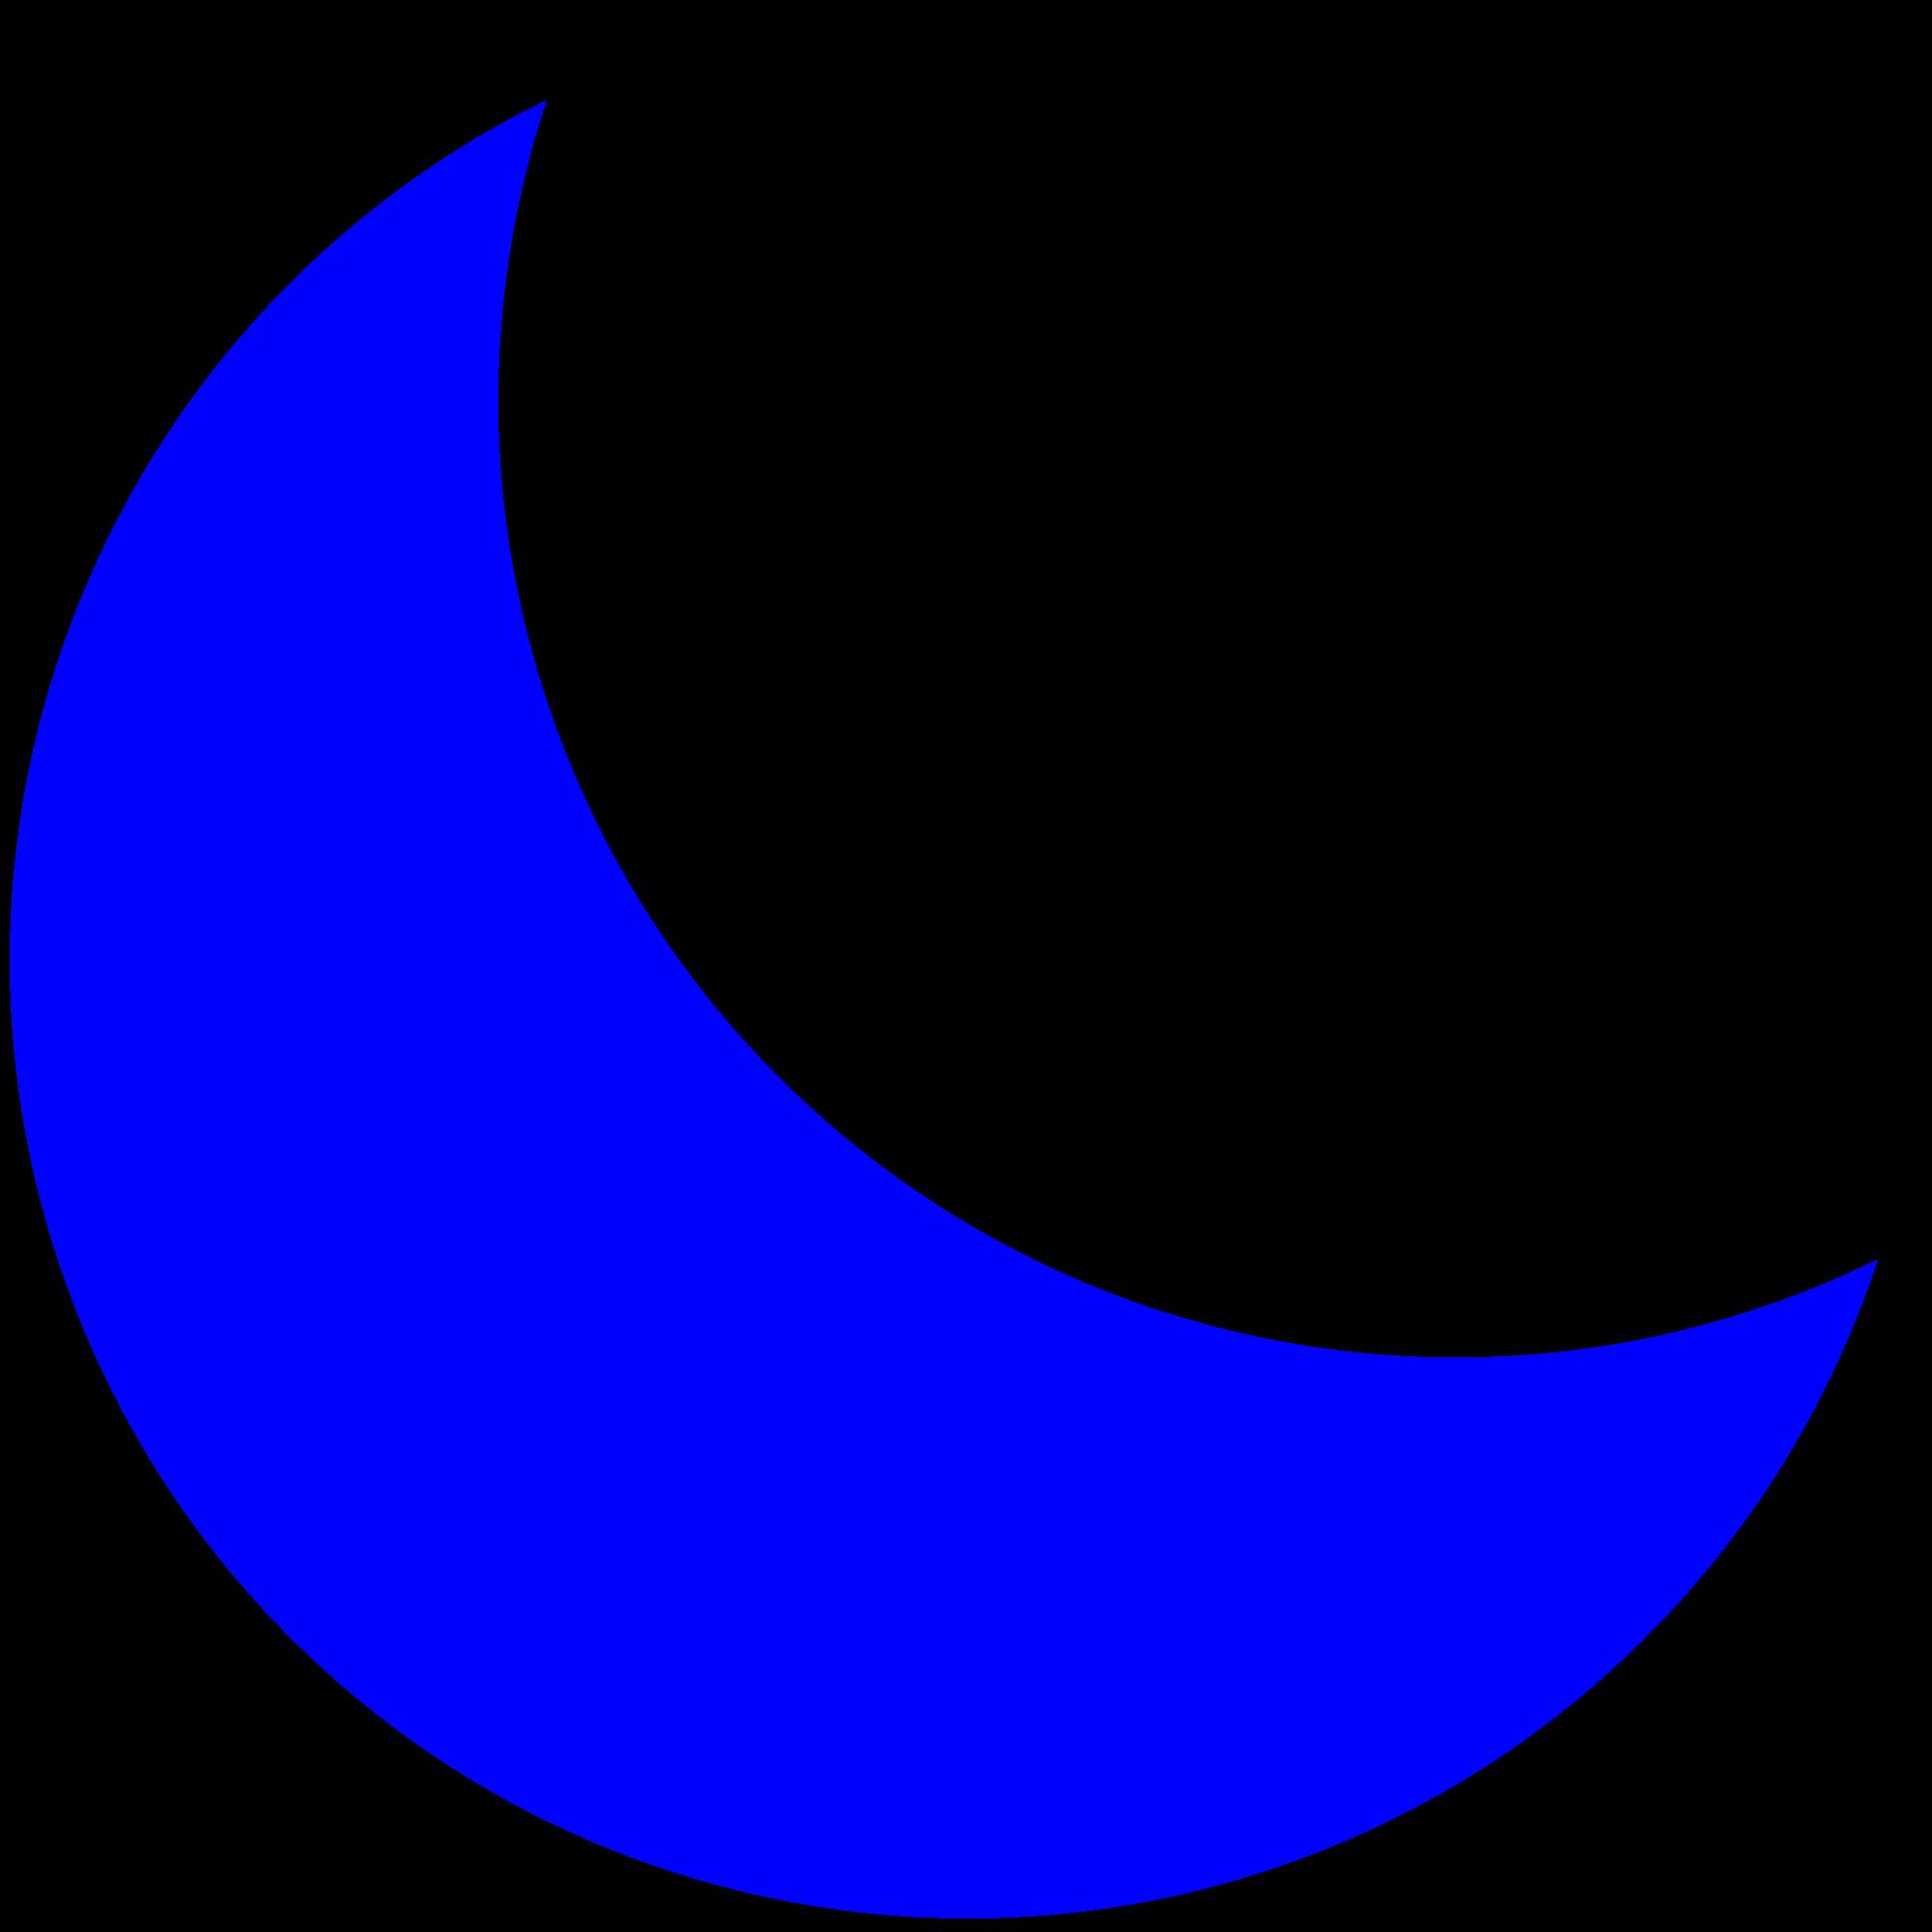 picture free Crescent clipart. Moonblueeeeyasmin